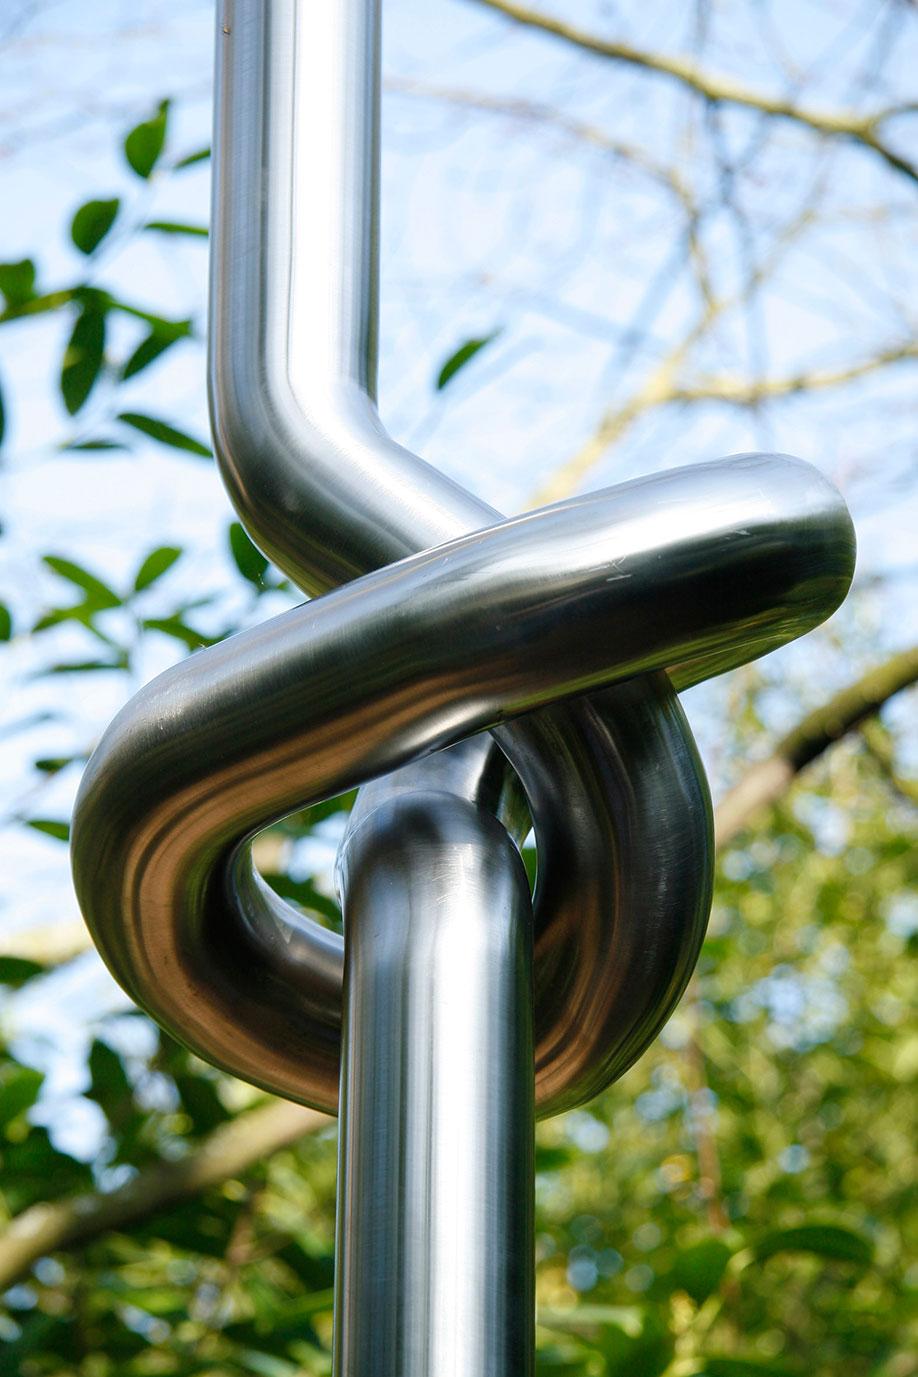 <b>Title:</b>Doodle Form<br /><b>Year:</b>2012<br /><b>Medium:</b>Stainless steel<br /><b>Size:</b>400 x 35 x 35 cm